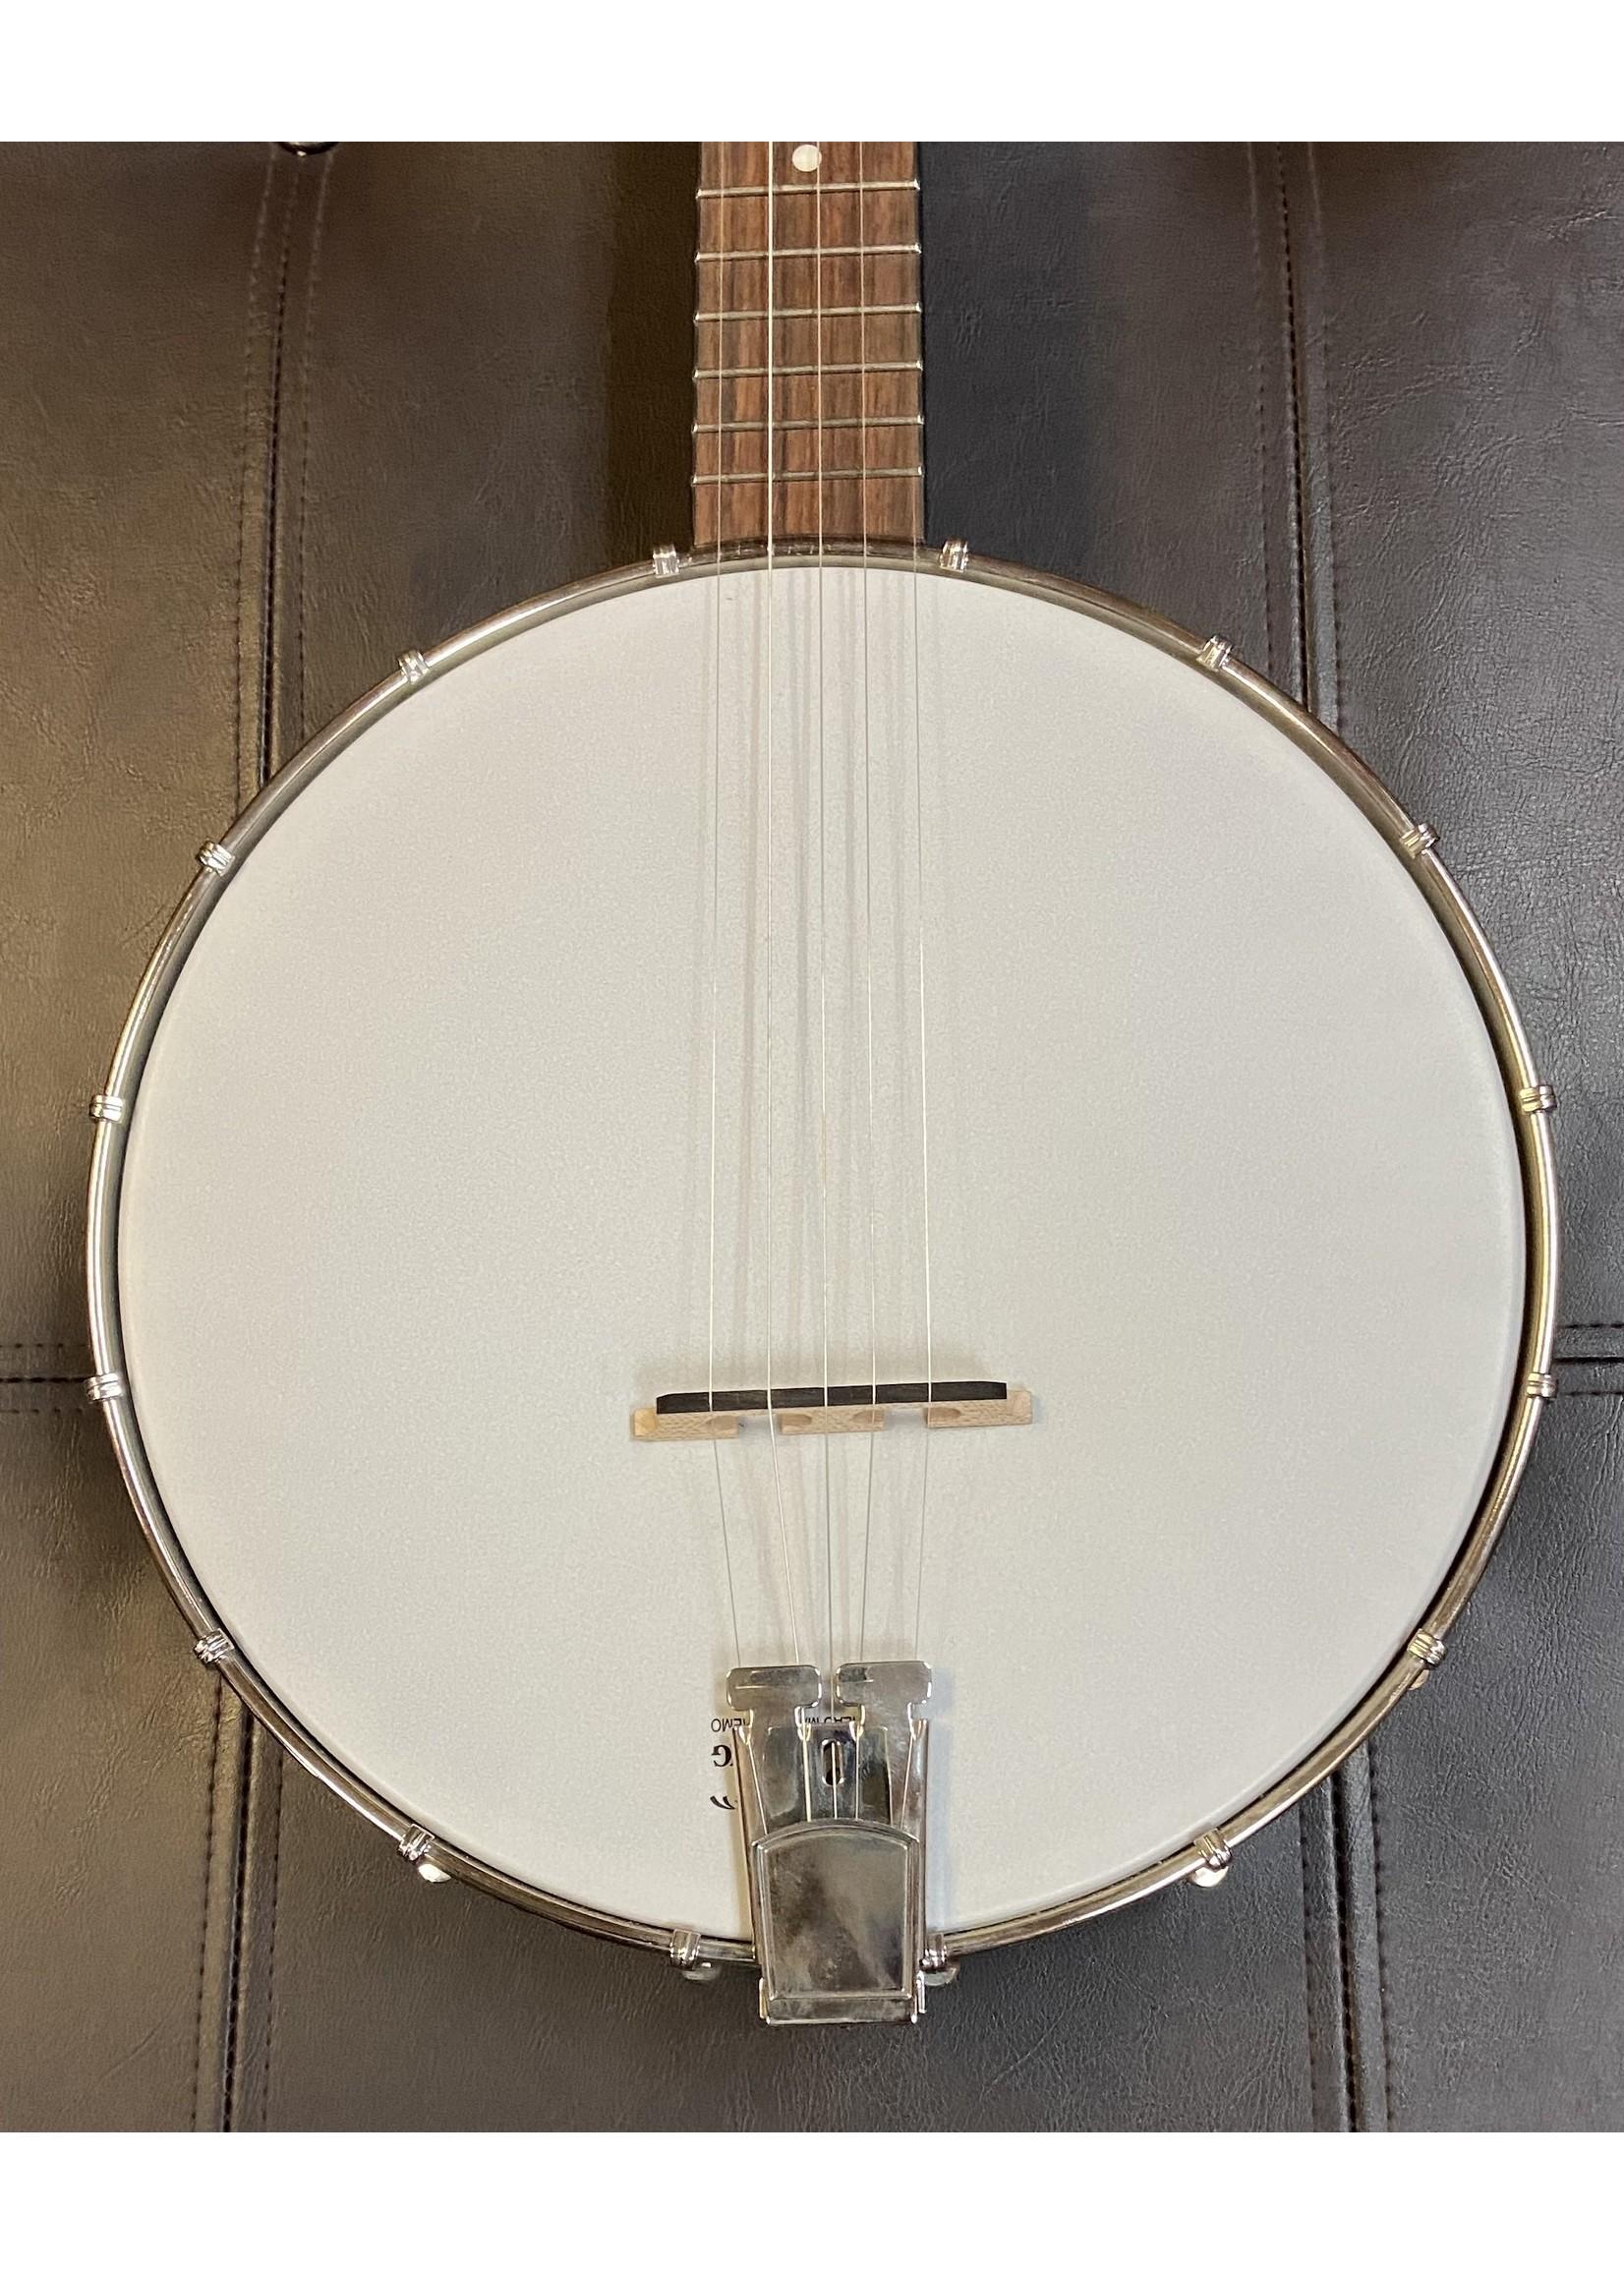 RECORDING KING Recording King Dirty '30s Open Back Banjo